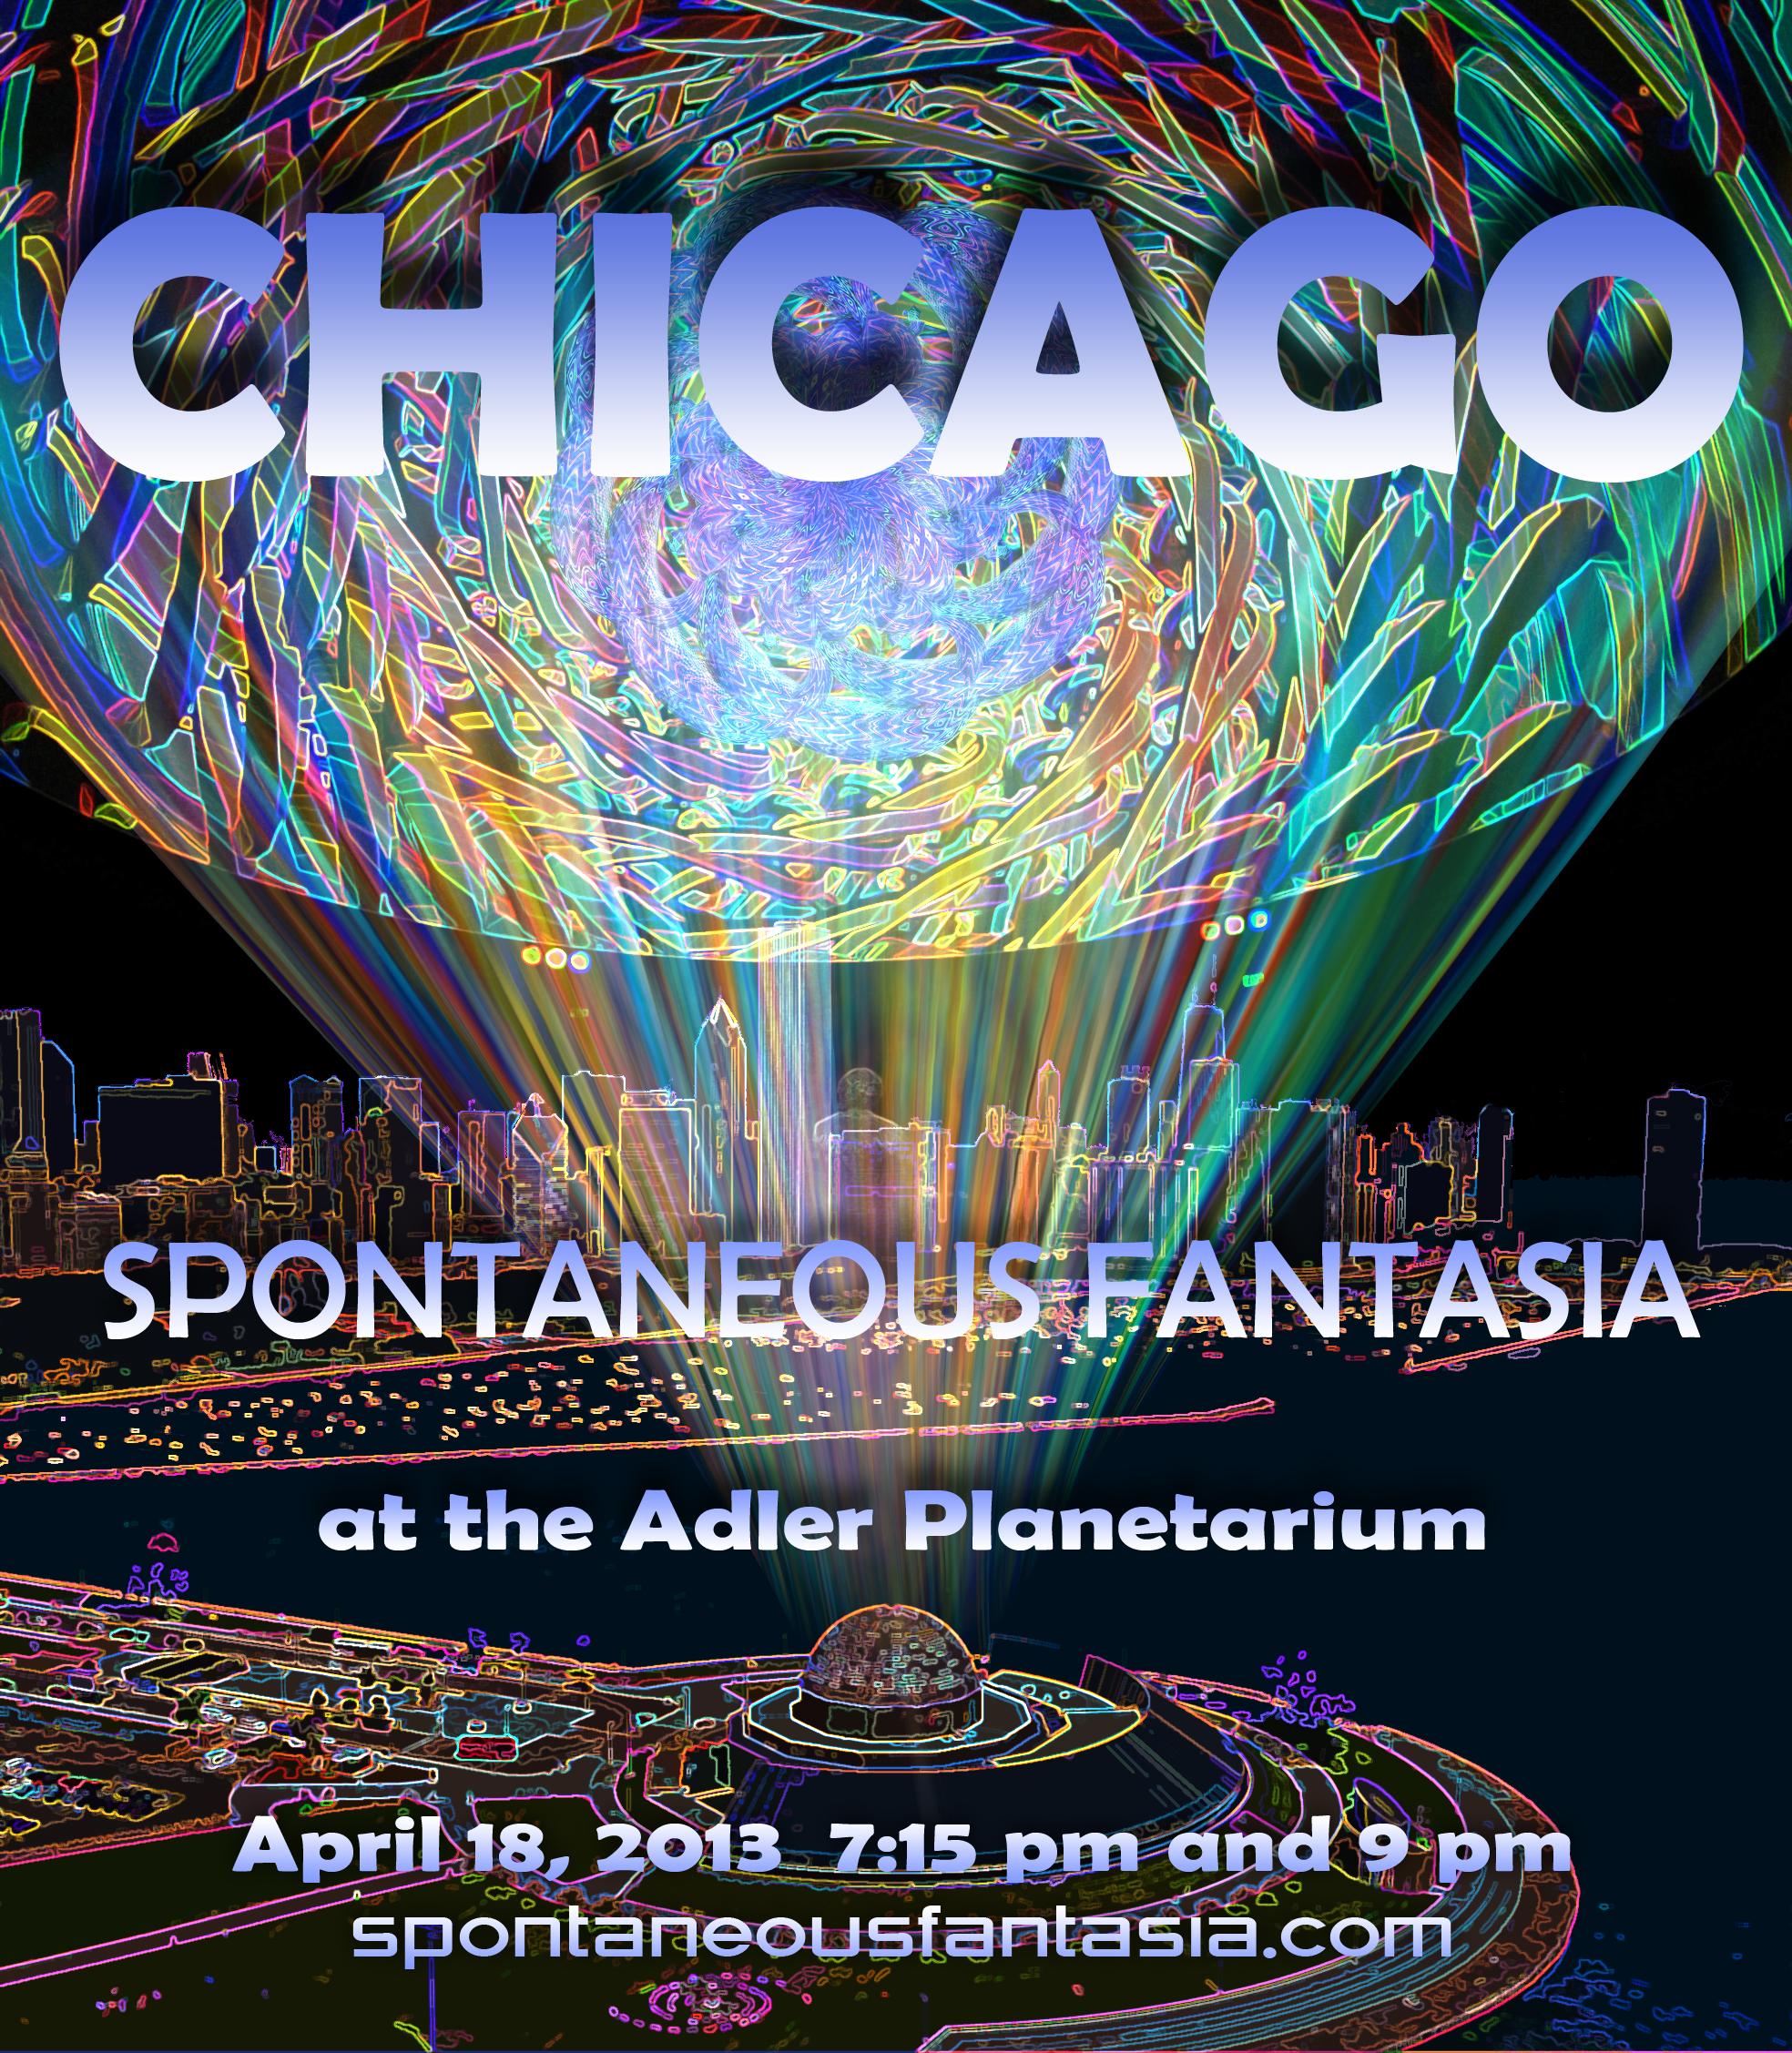 Adler Planetarium Performances 2013 - Spontaneous Fantasia